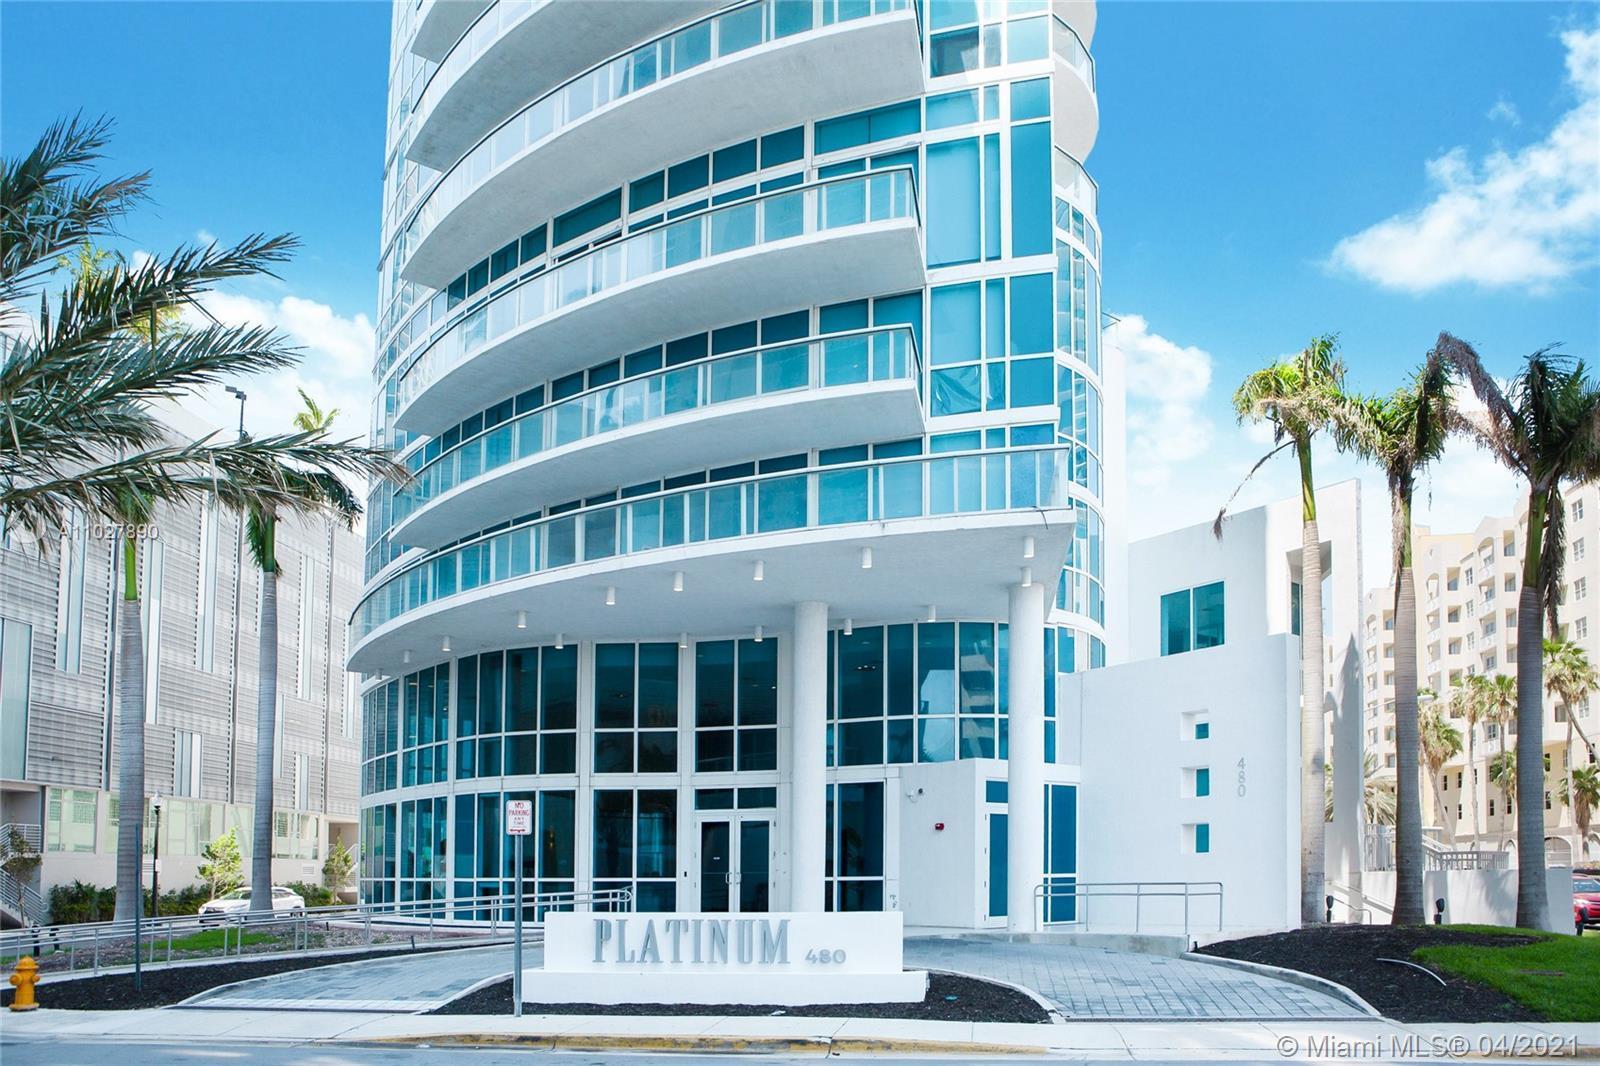 Enjoy an amazing 2BED + DEN / 2BATH corner unit with water views at the Platinum Condominium. Floor